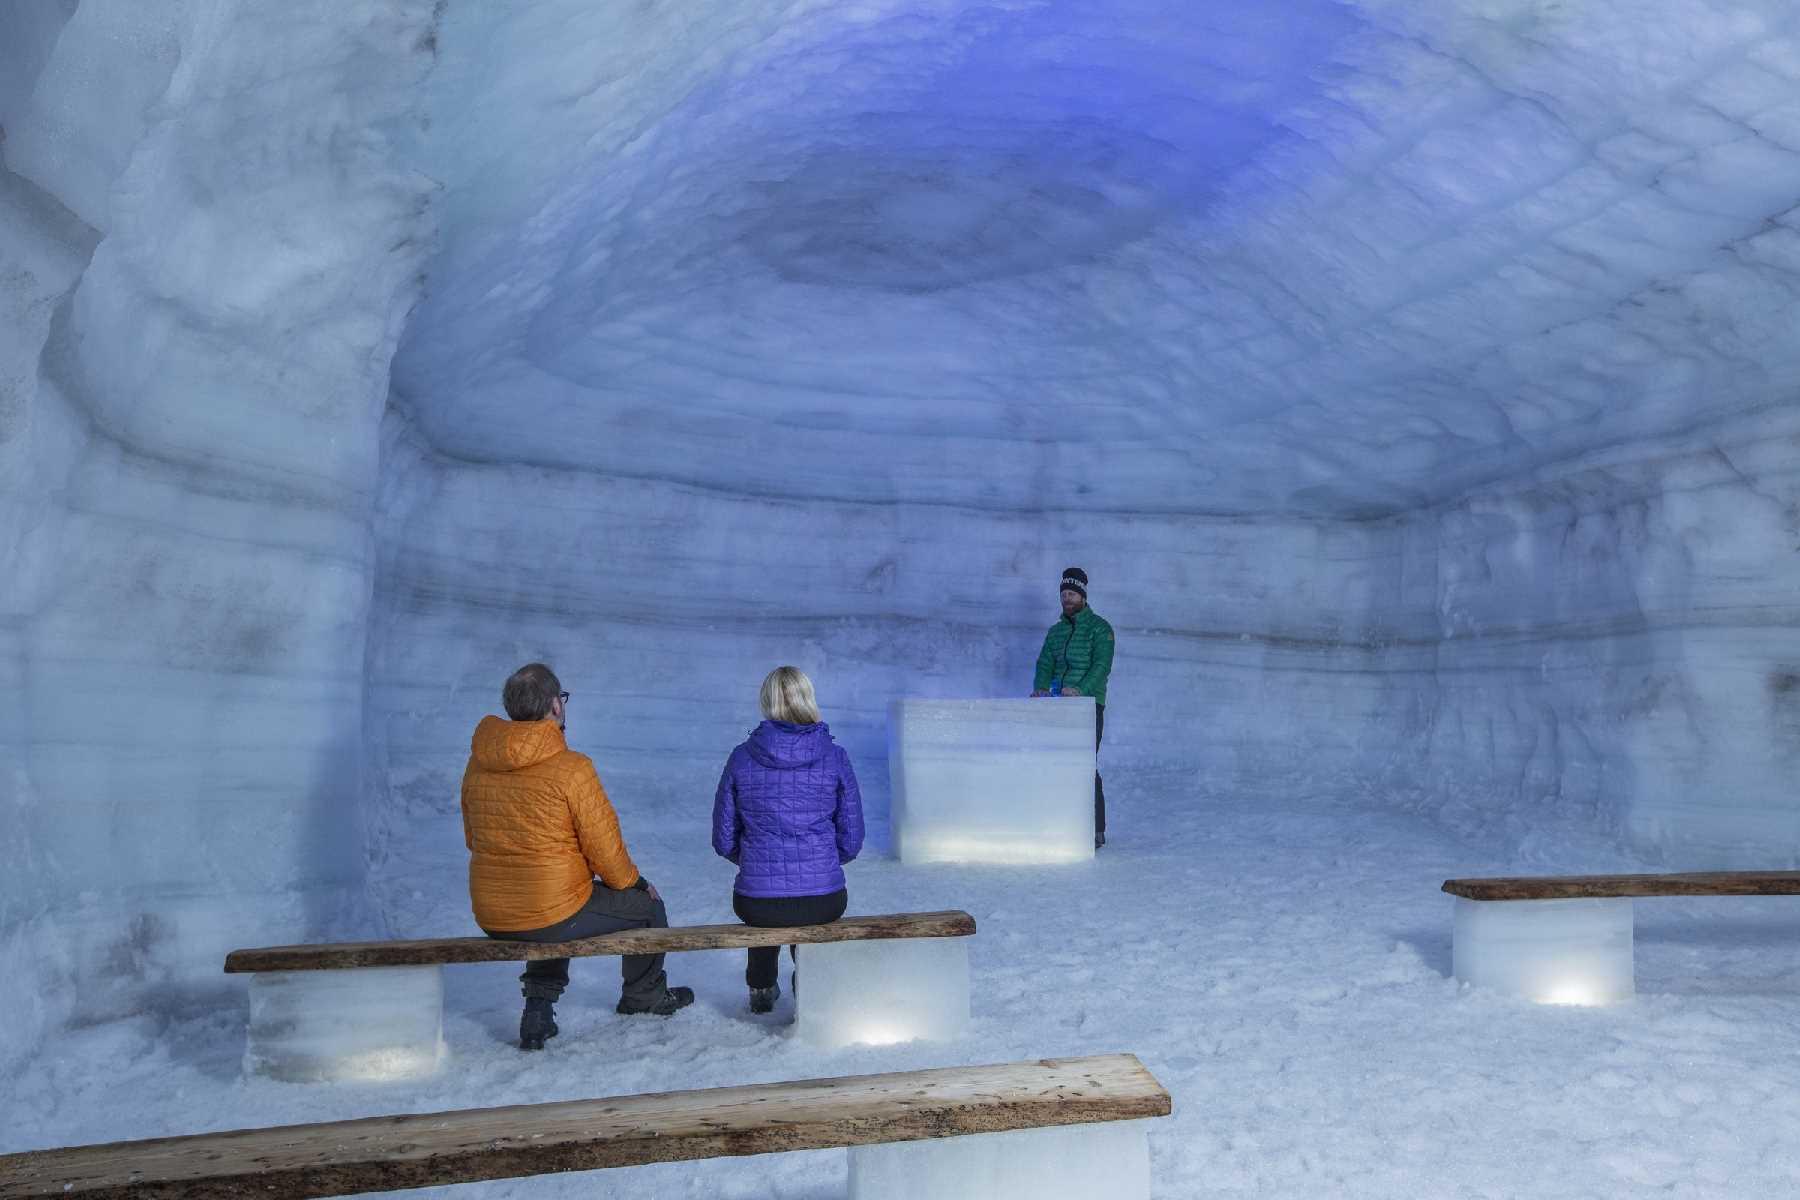 Skarpi_iceland icelandic times